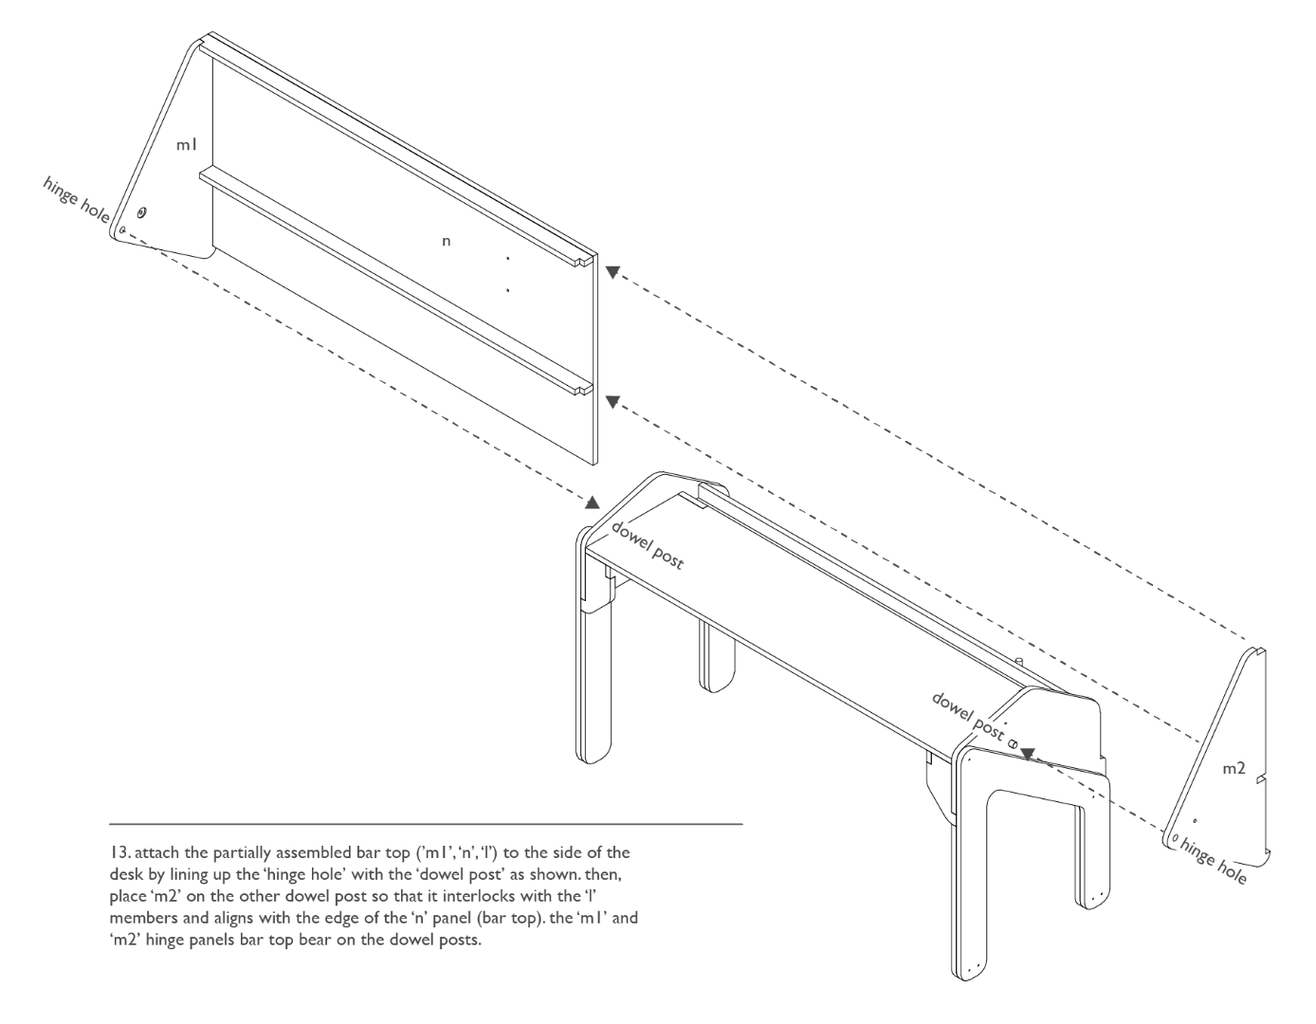 Assembly: Folding Bar Top